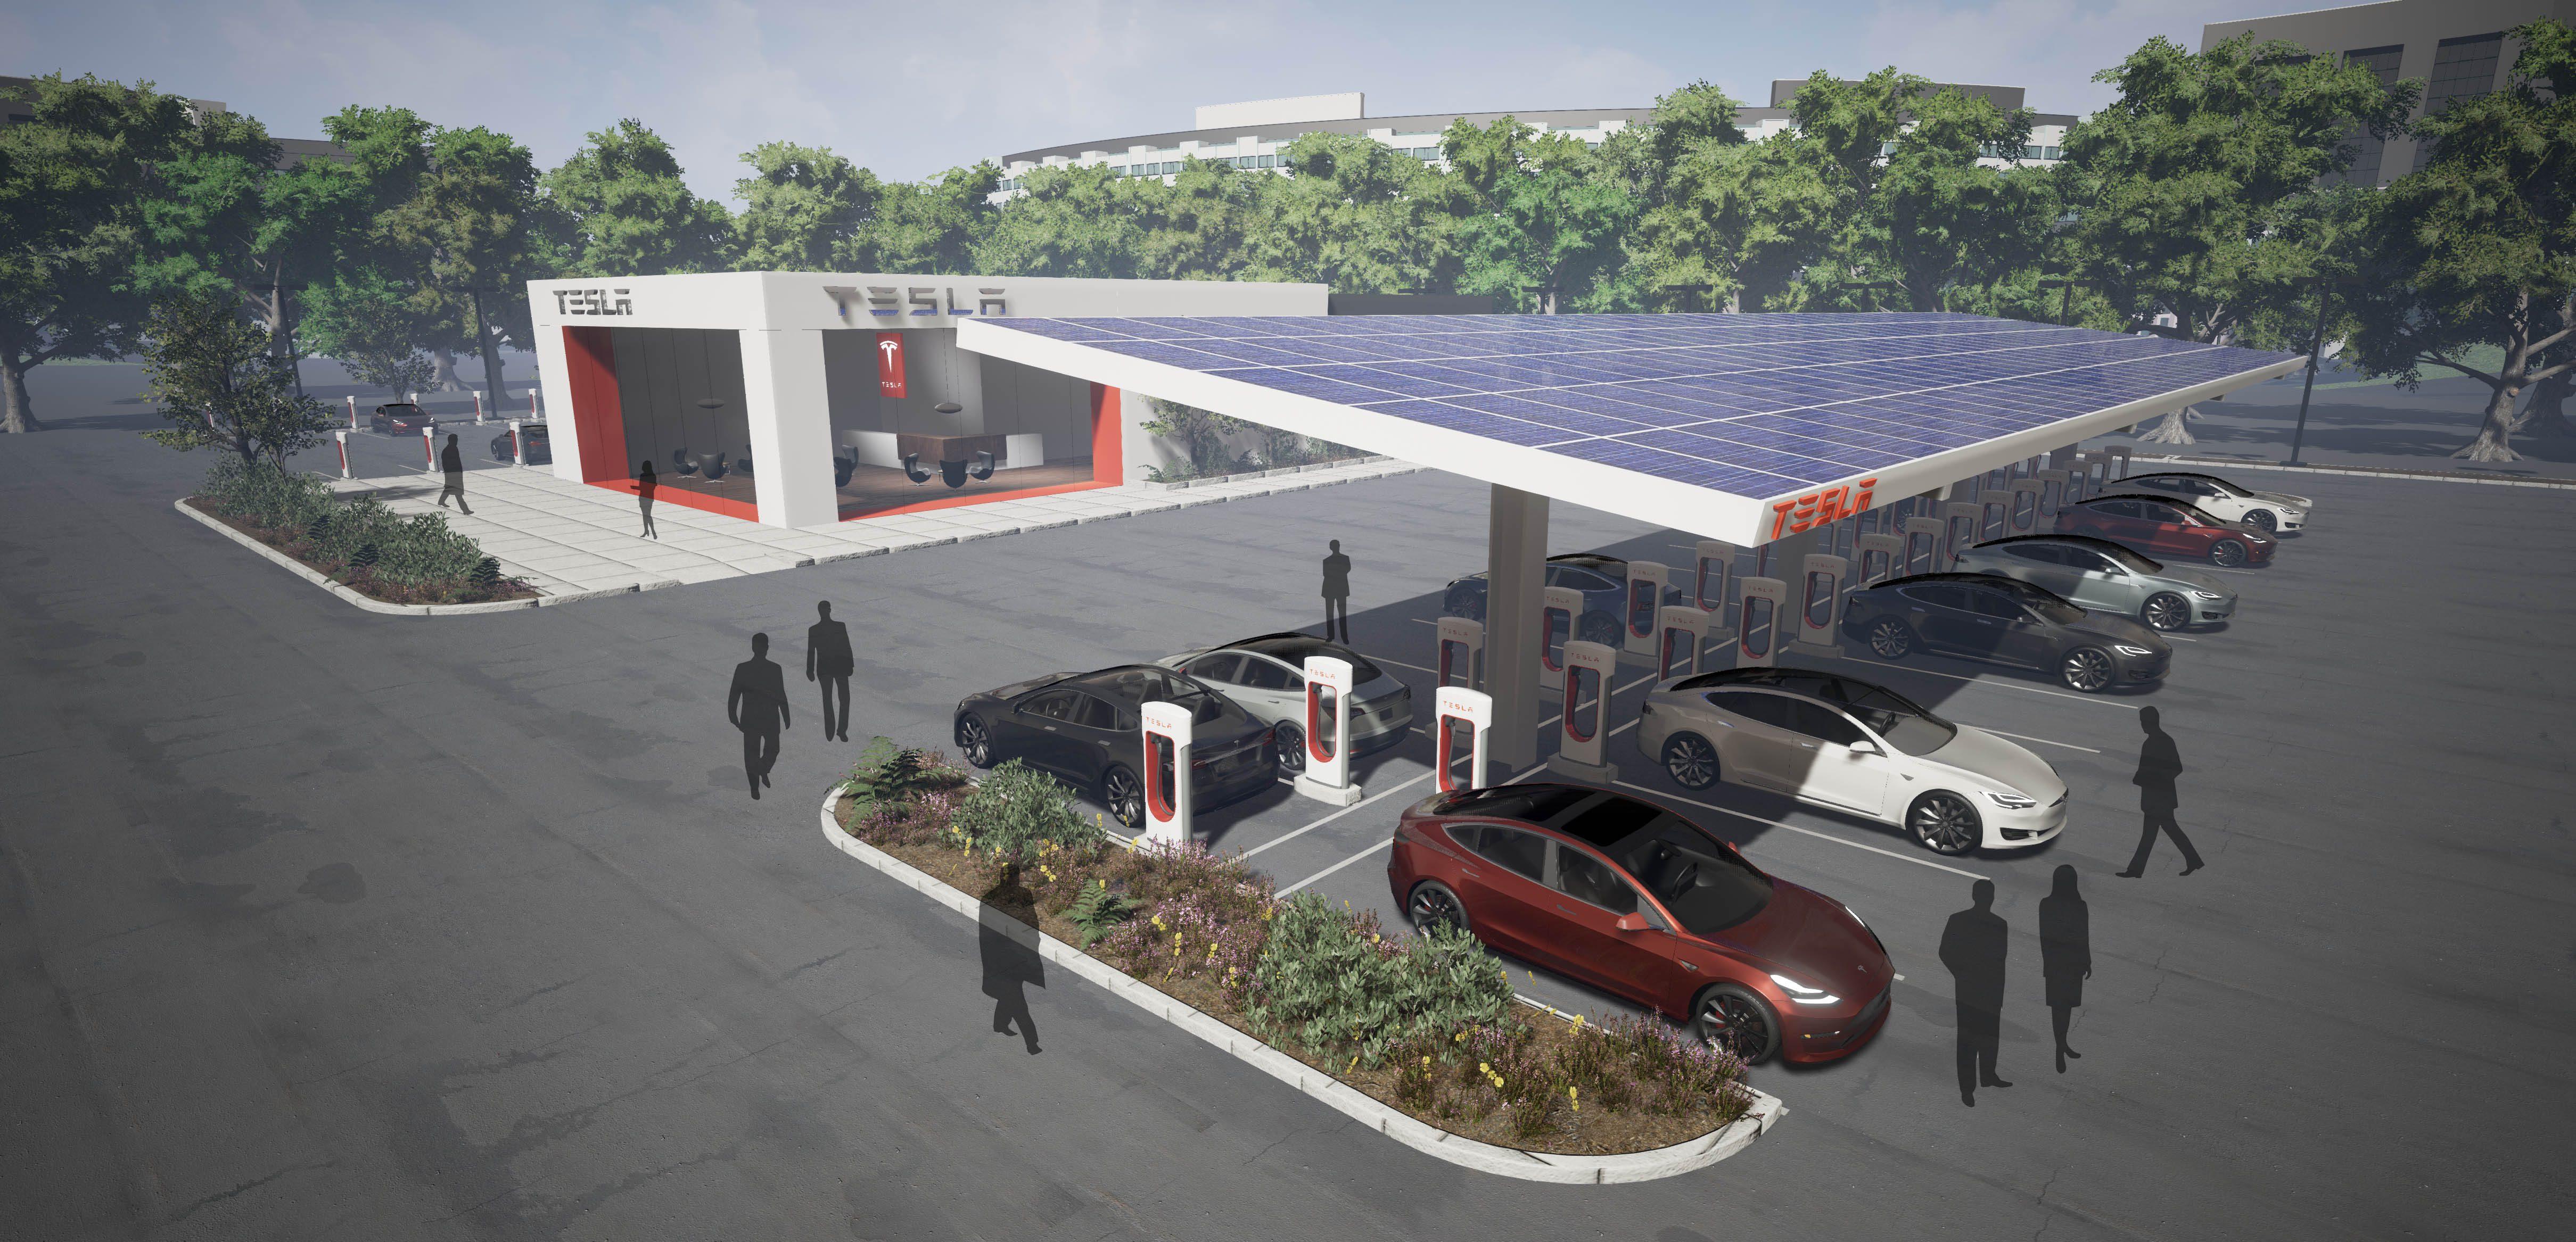 Tesla supercharger station locations